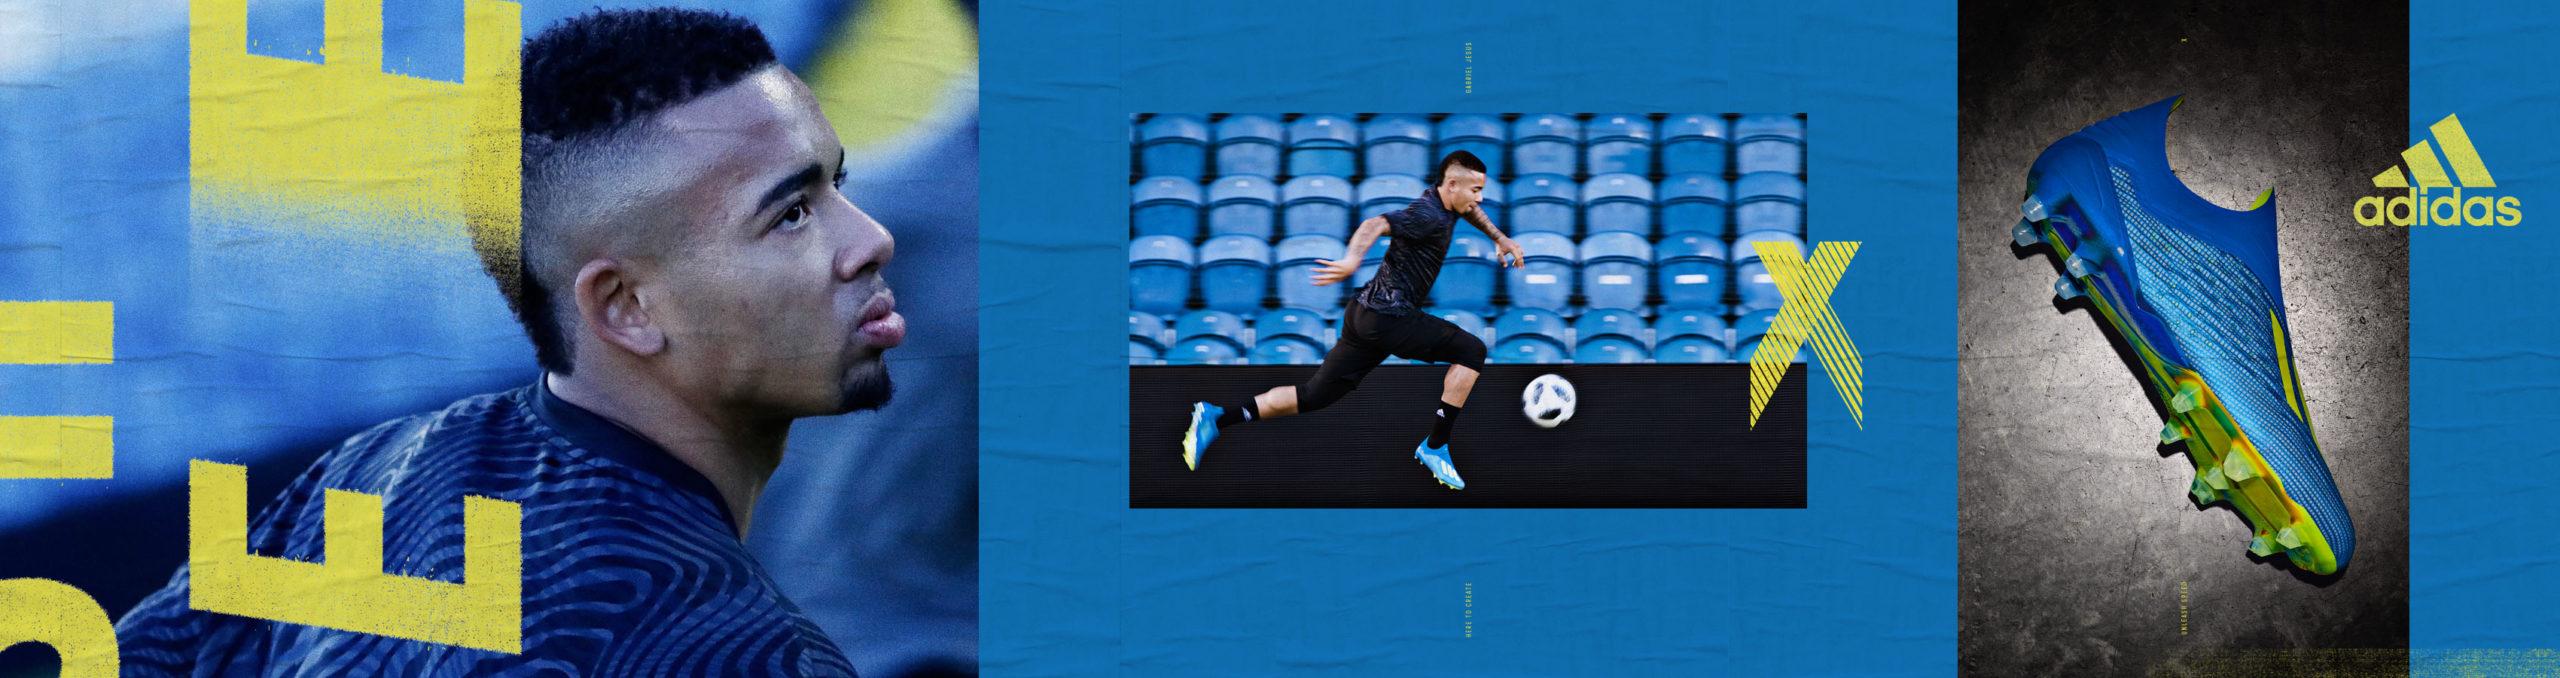 RobsonUnited2020_adidasFW18_Energy01